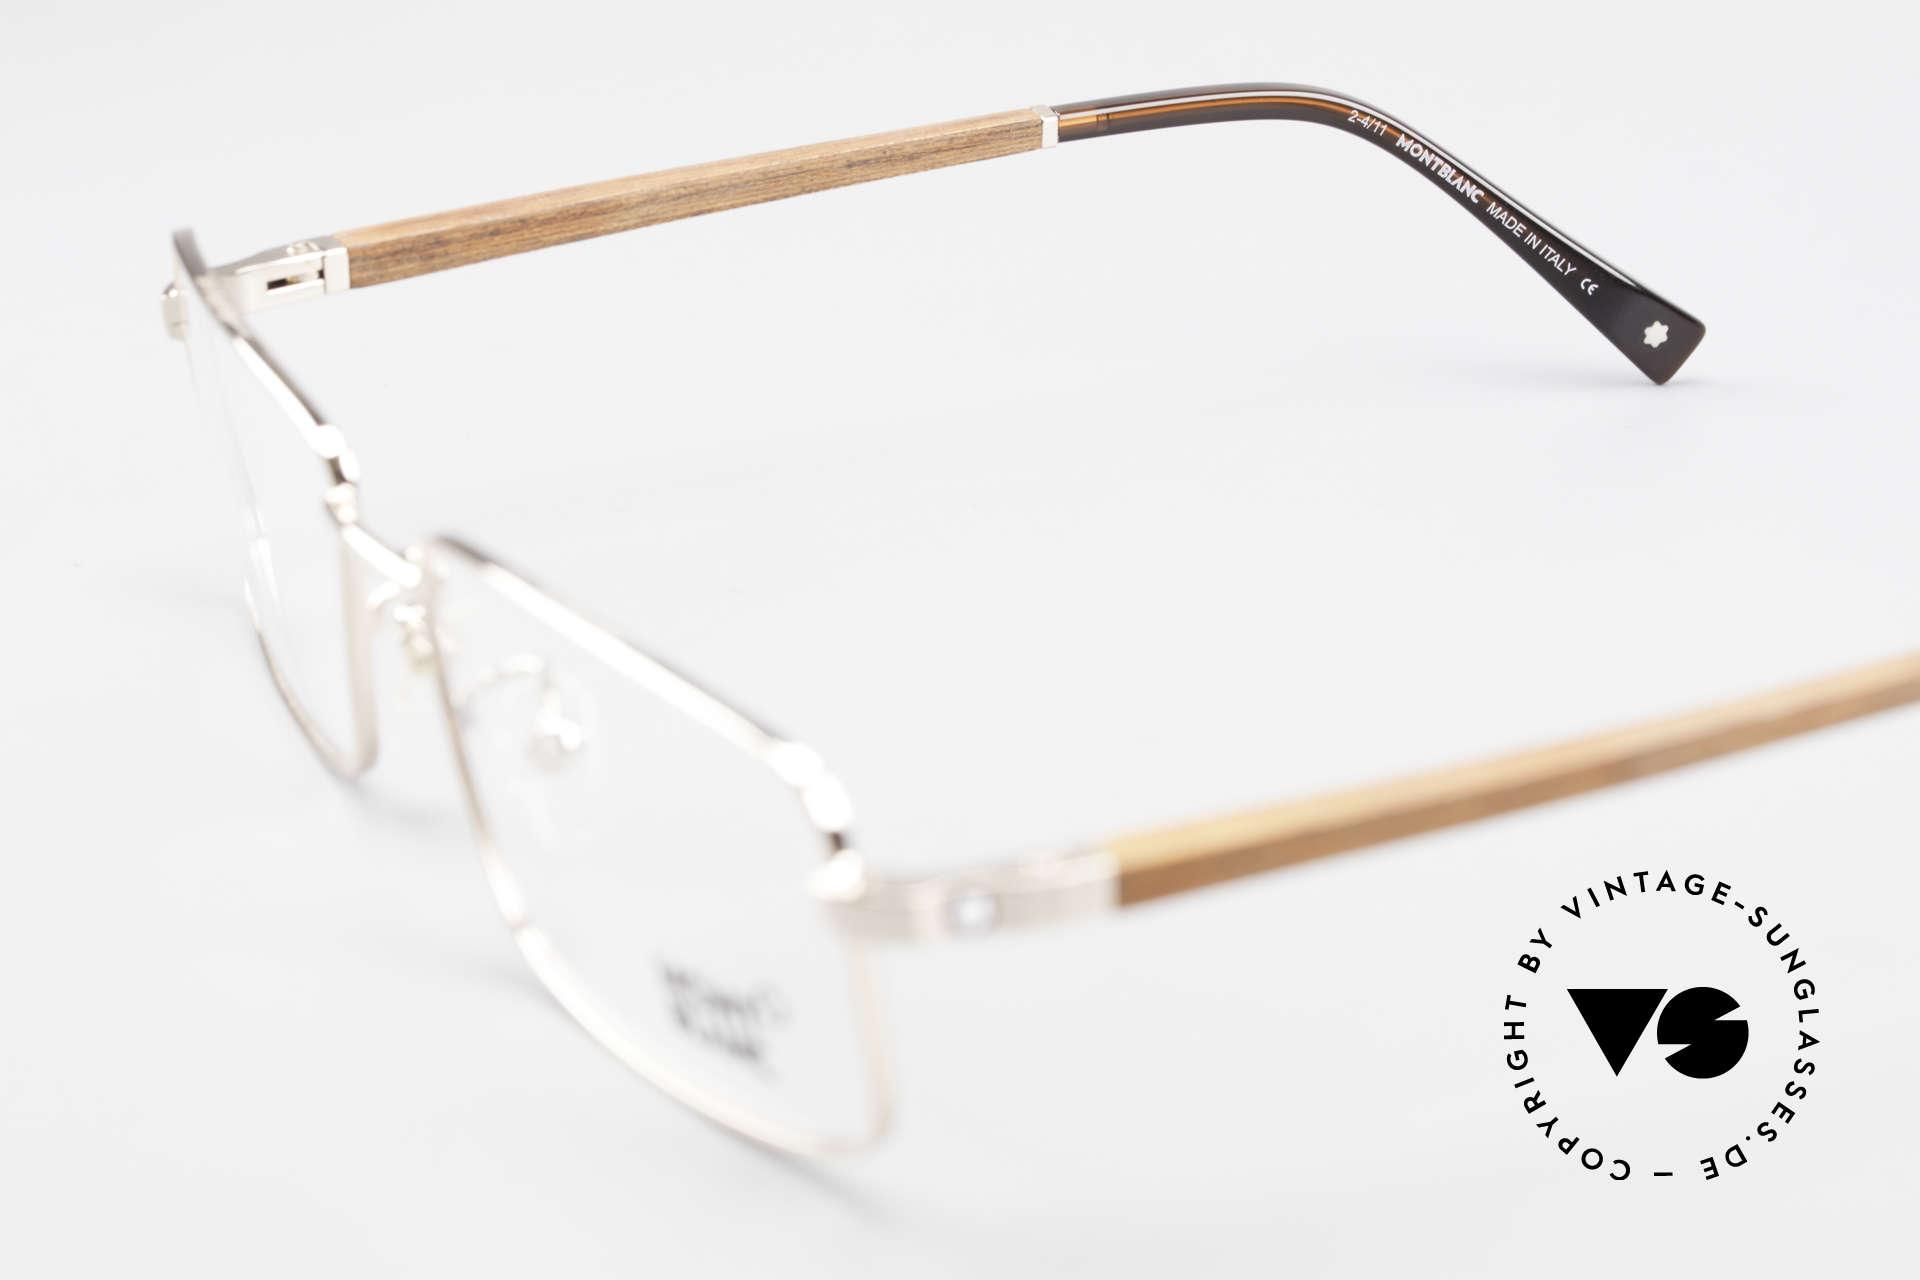 Montblanc MB389 Gold-Plated Wood Glasses Men, Size: medium, Made for Men